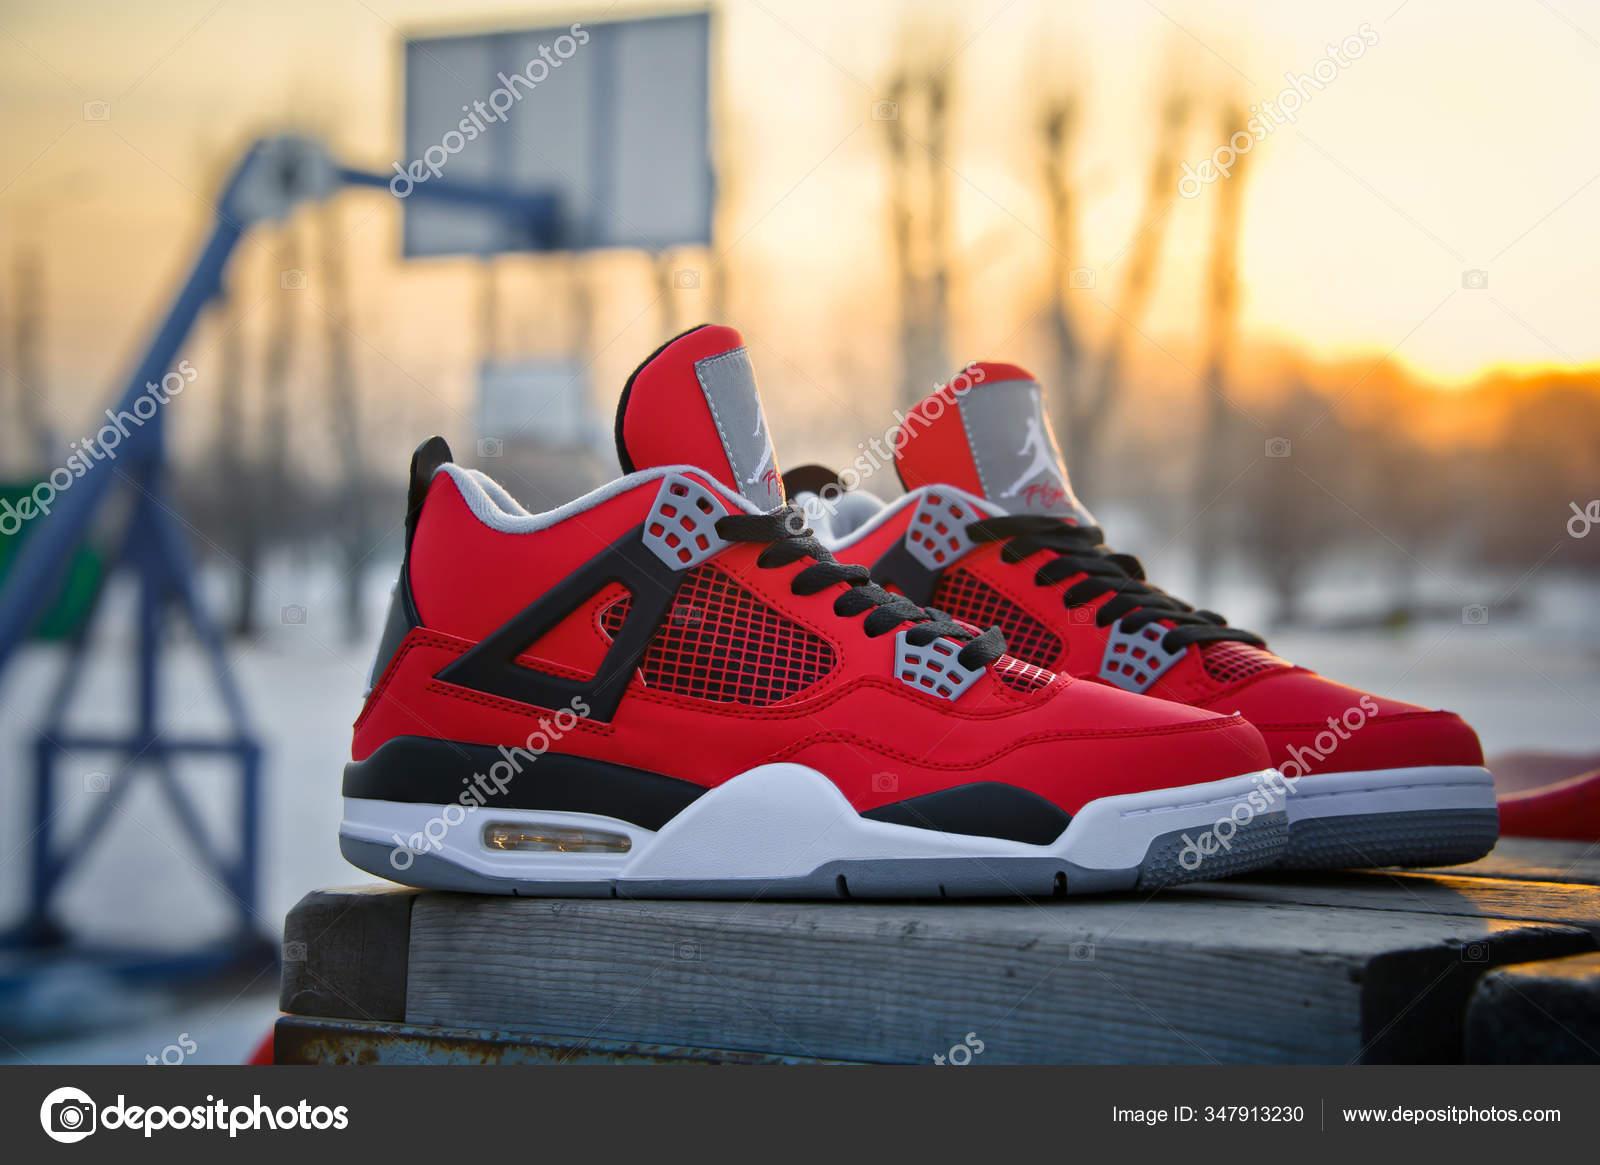 Fire Red Nike Air Jordan Retro